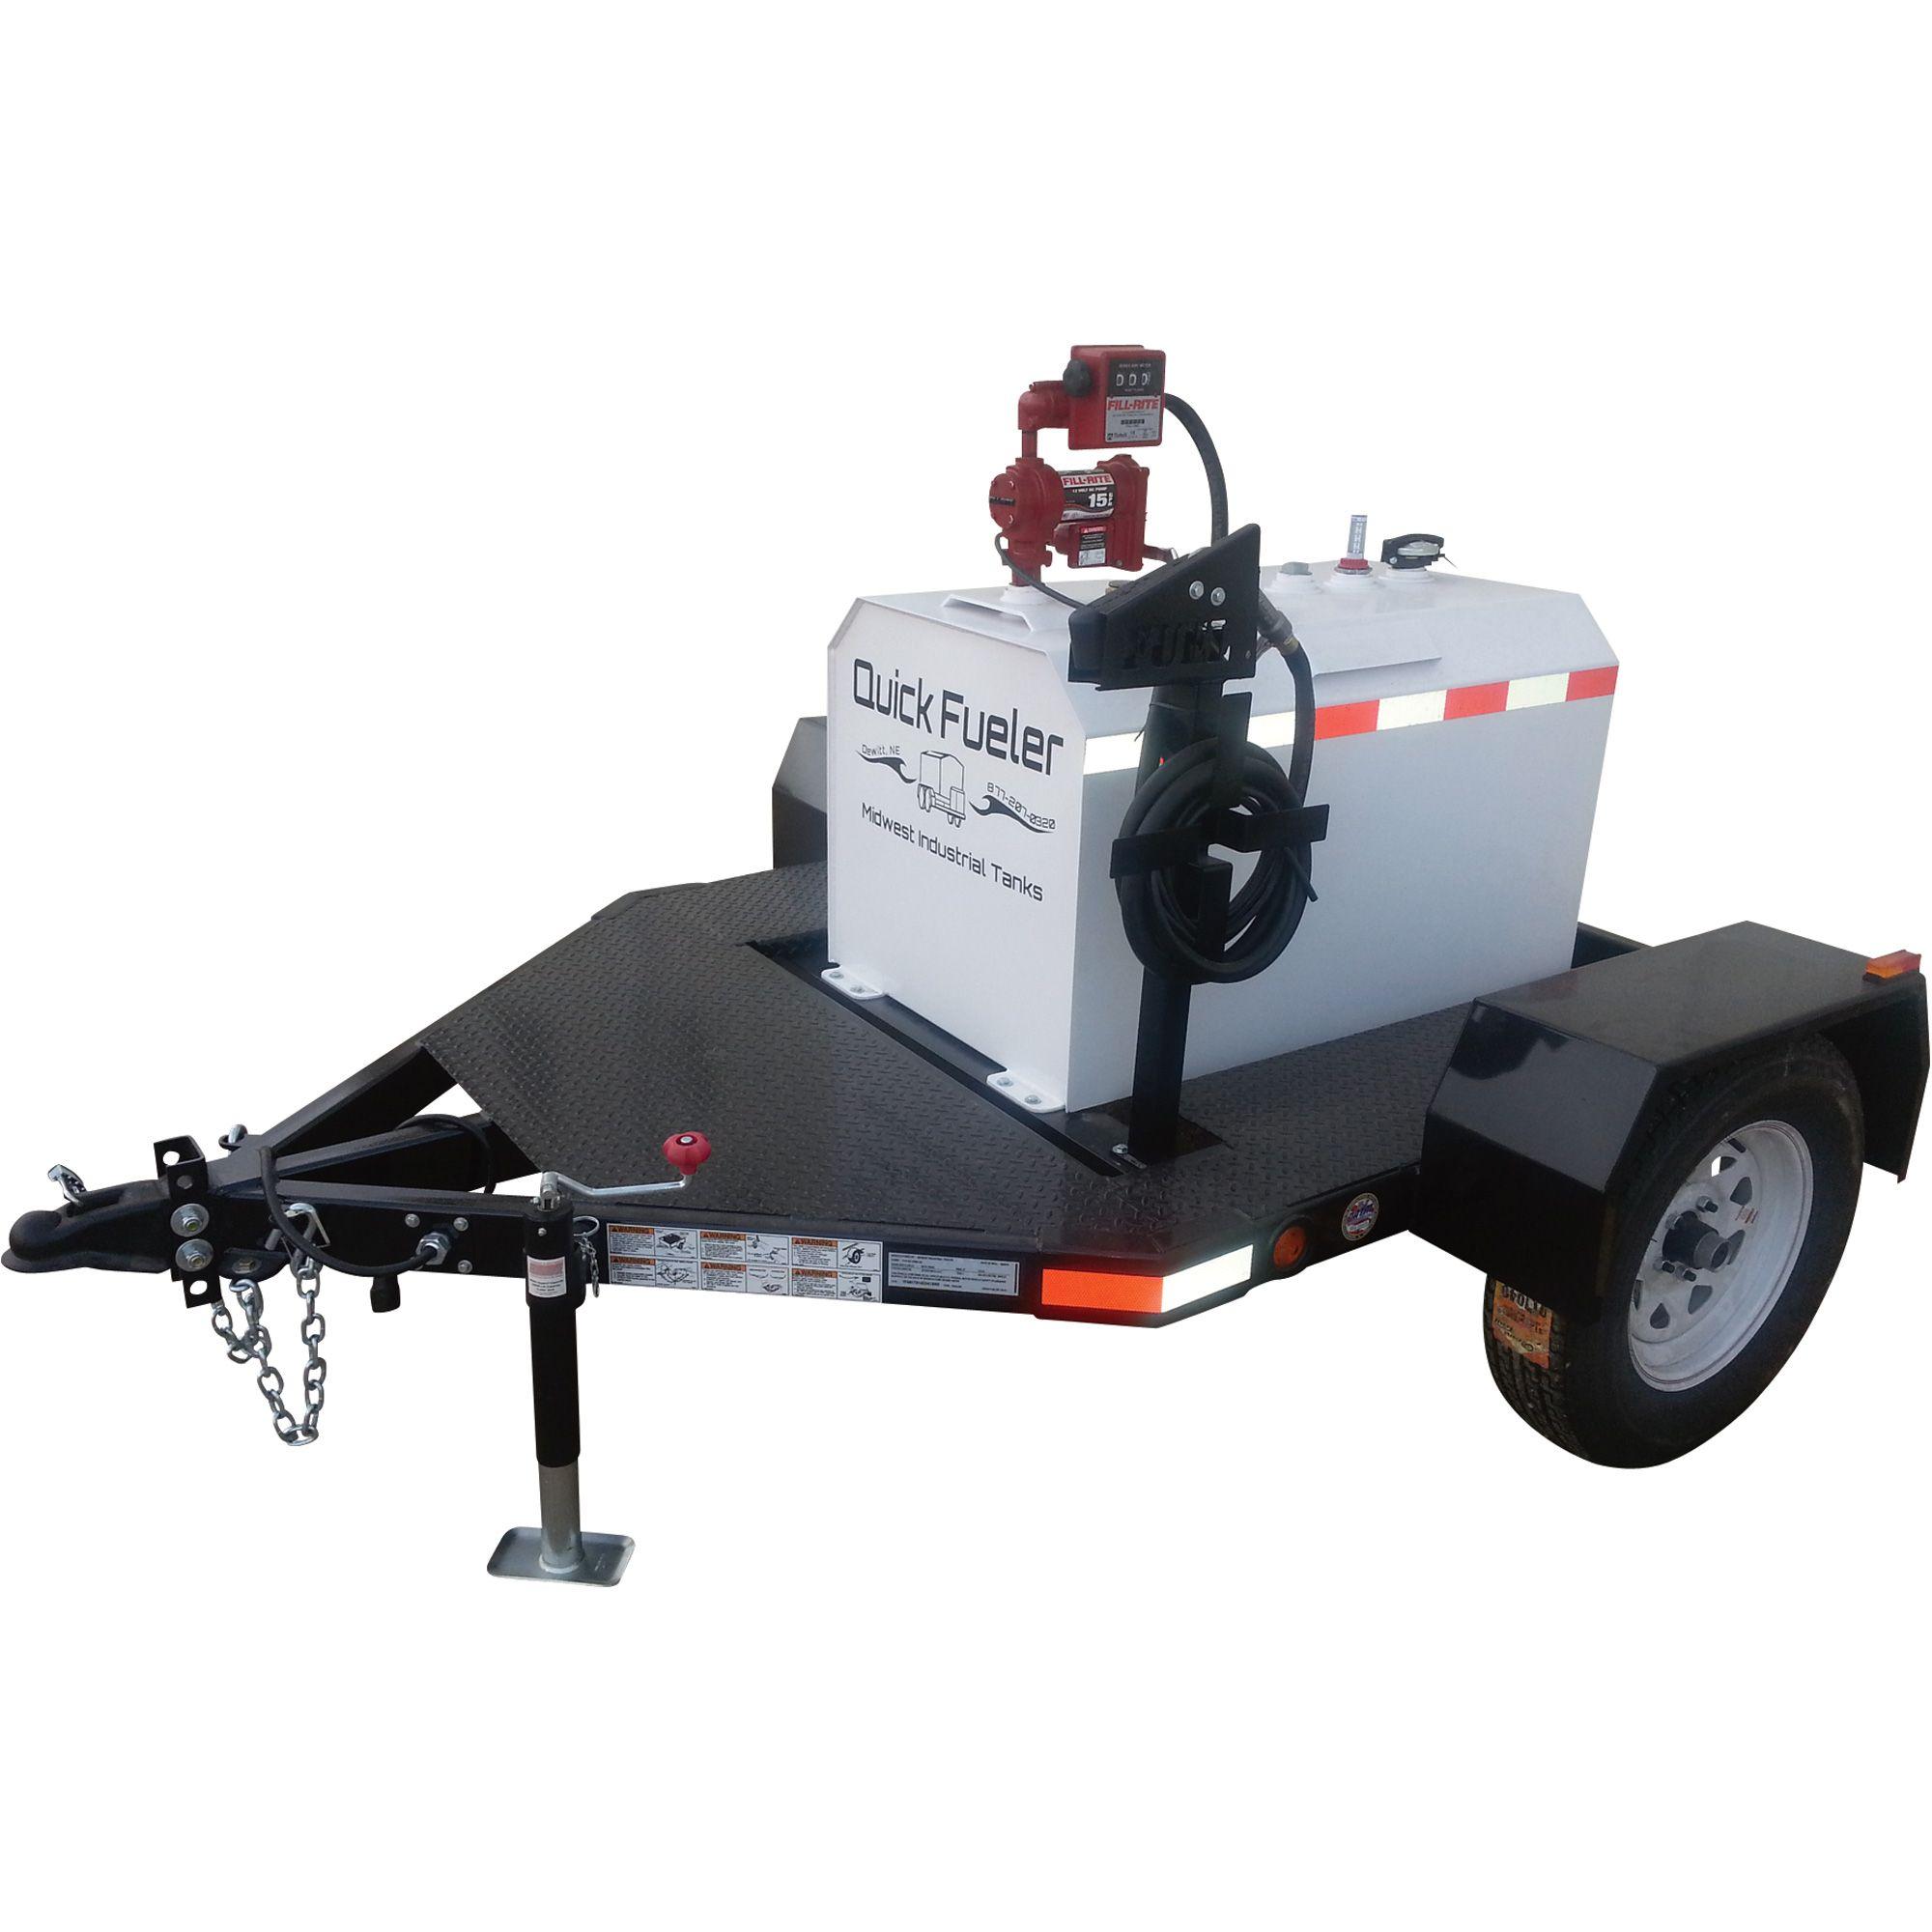 Midwest Industrial Tanks Quick Fueler Fuel Trailer — 115